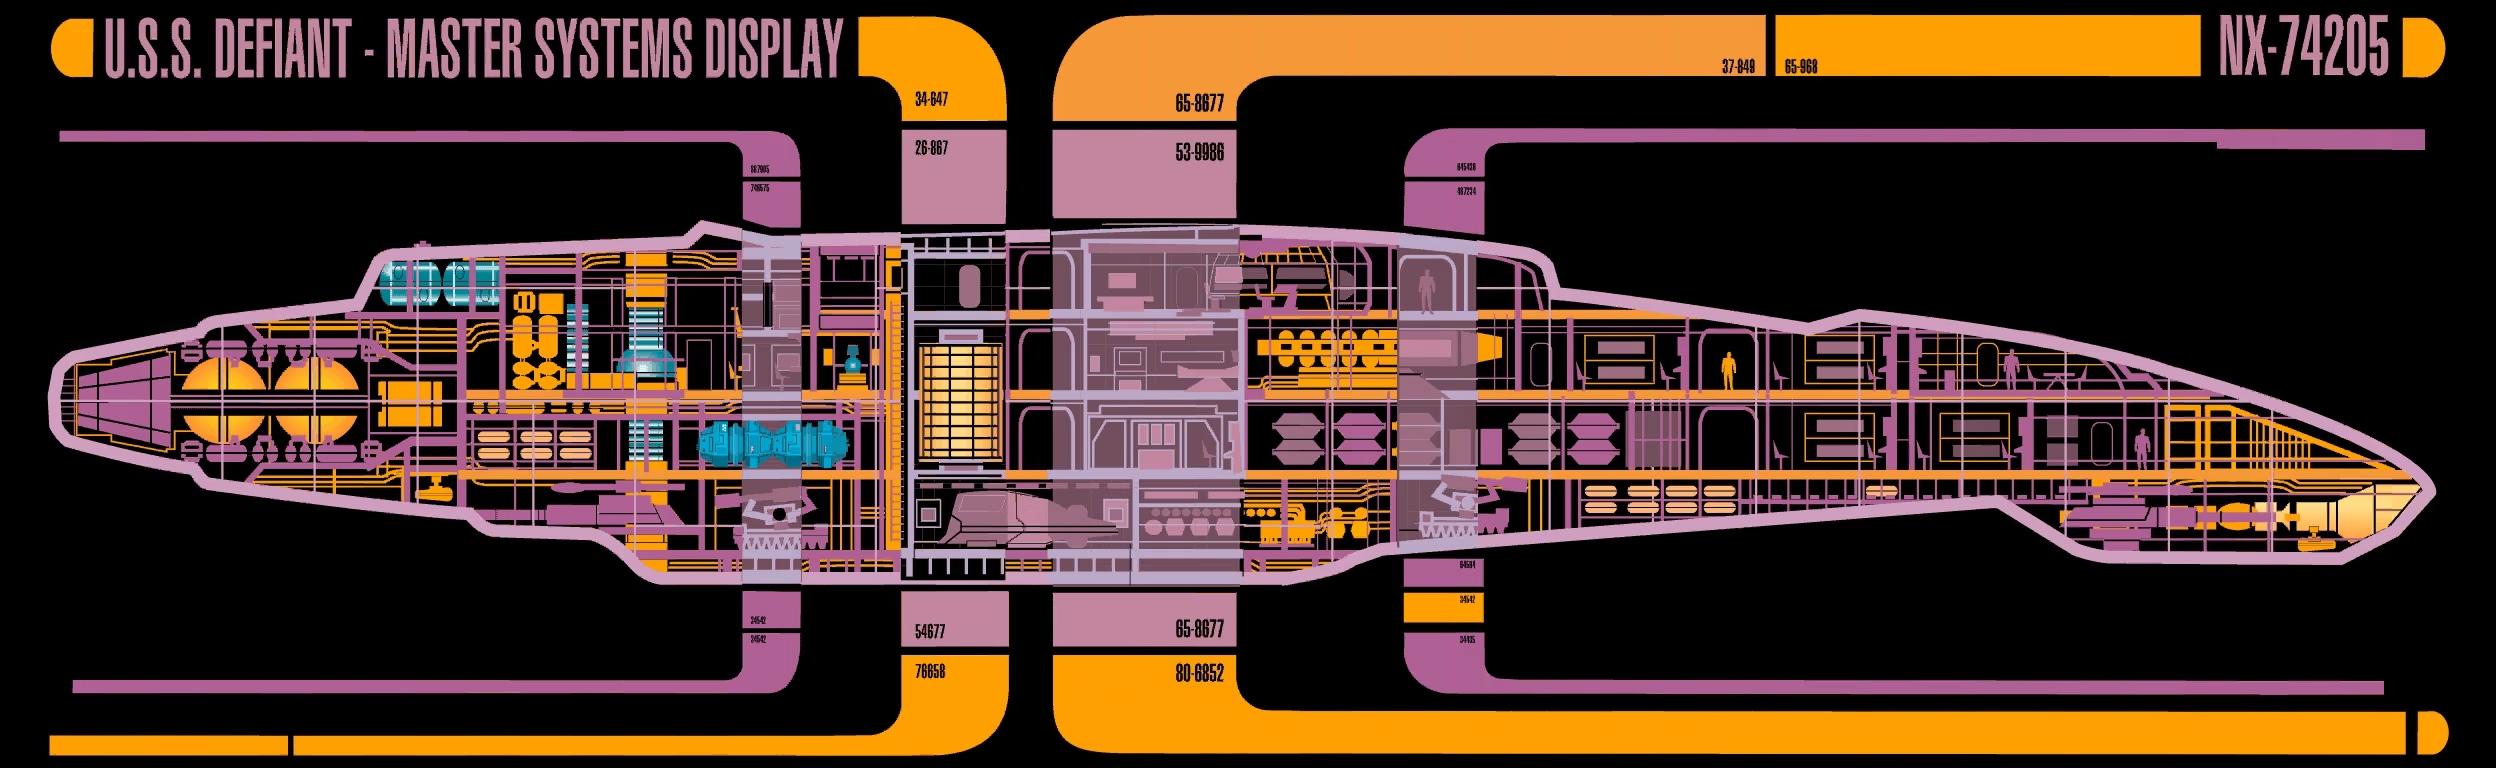 FRIQUIS SPACE (CUADERNO DE VITACORAS) Defiant_class_MSD